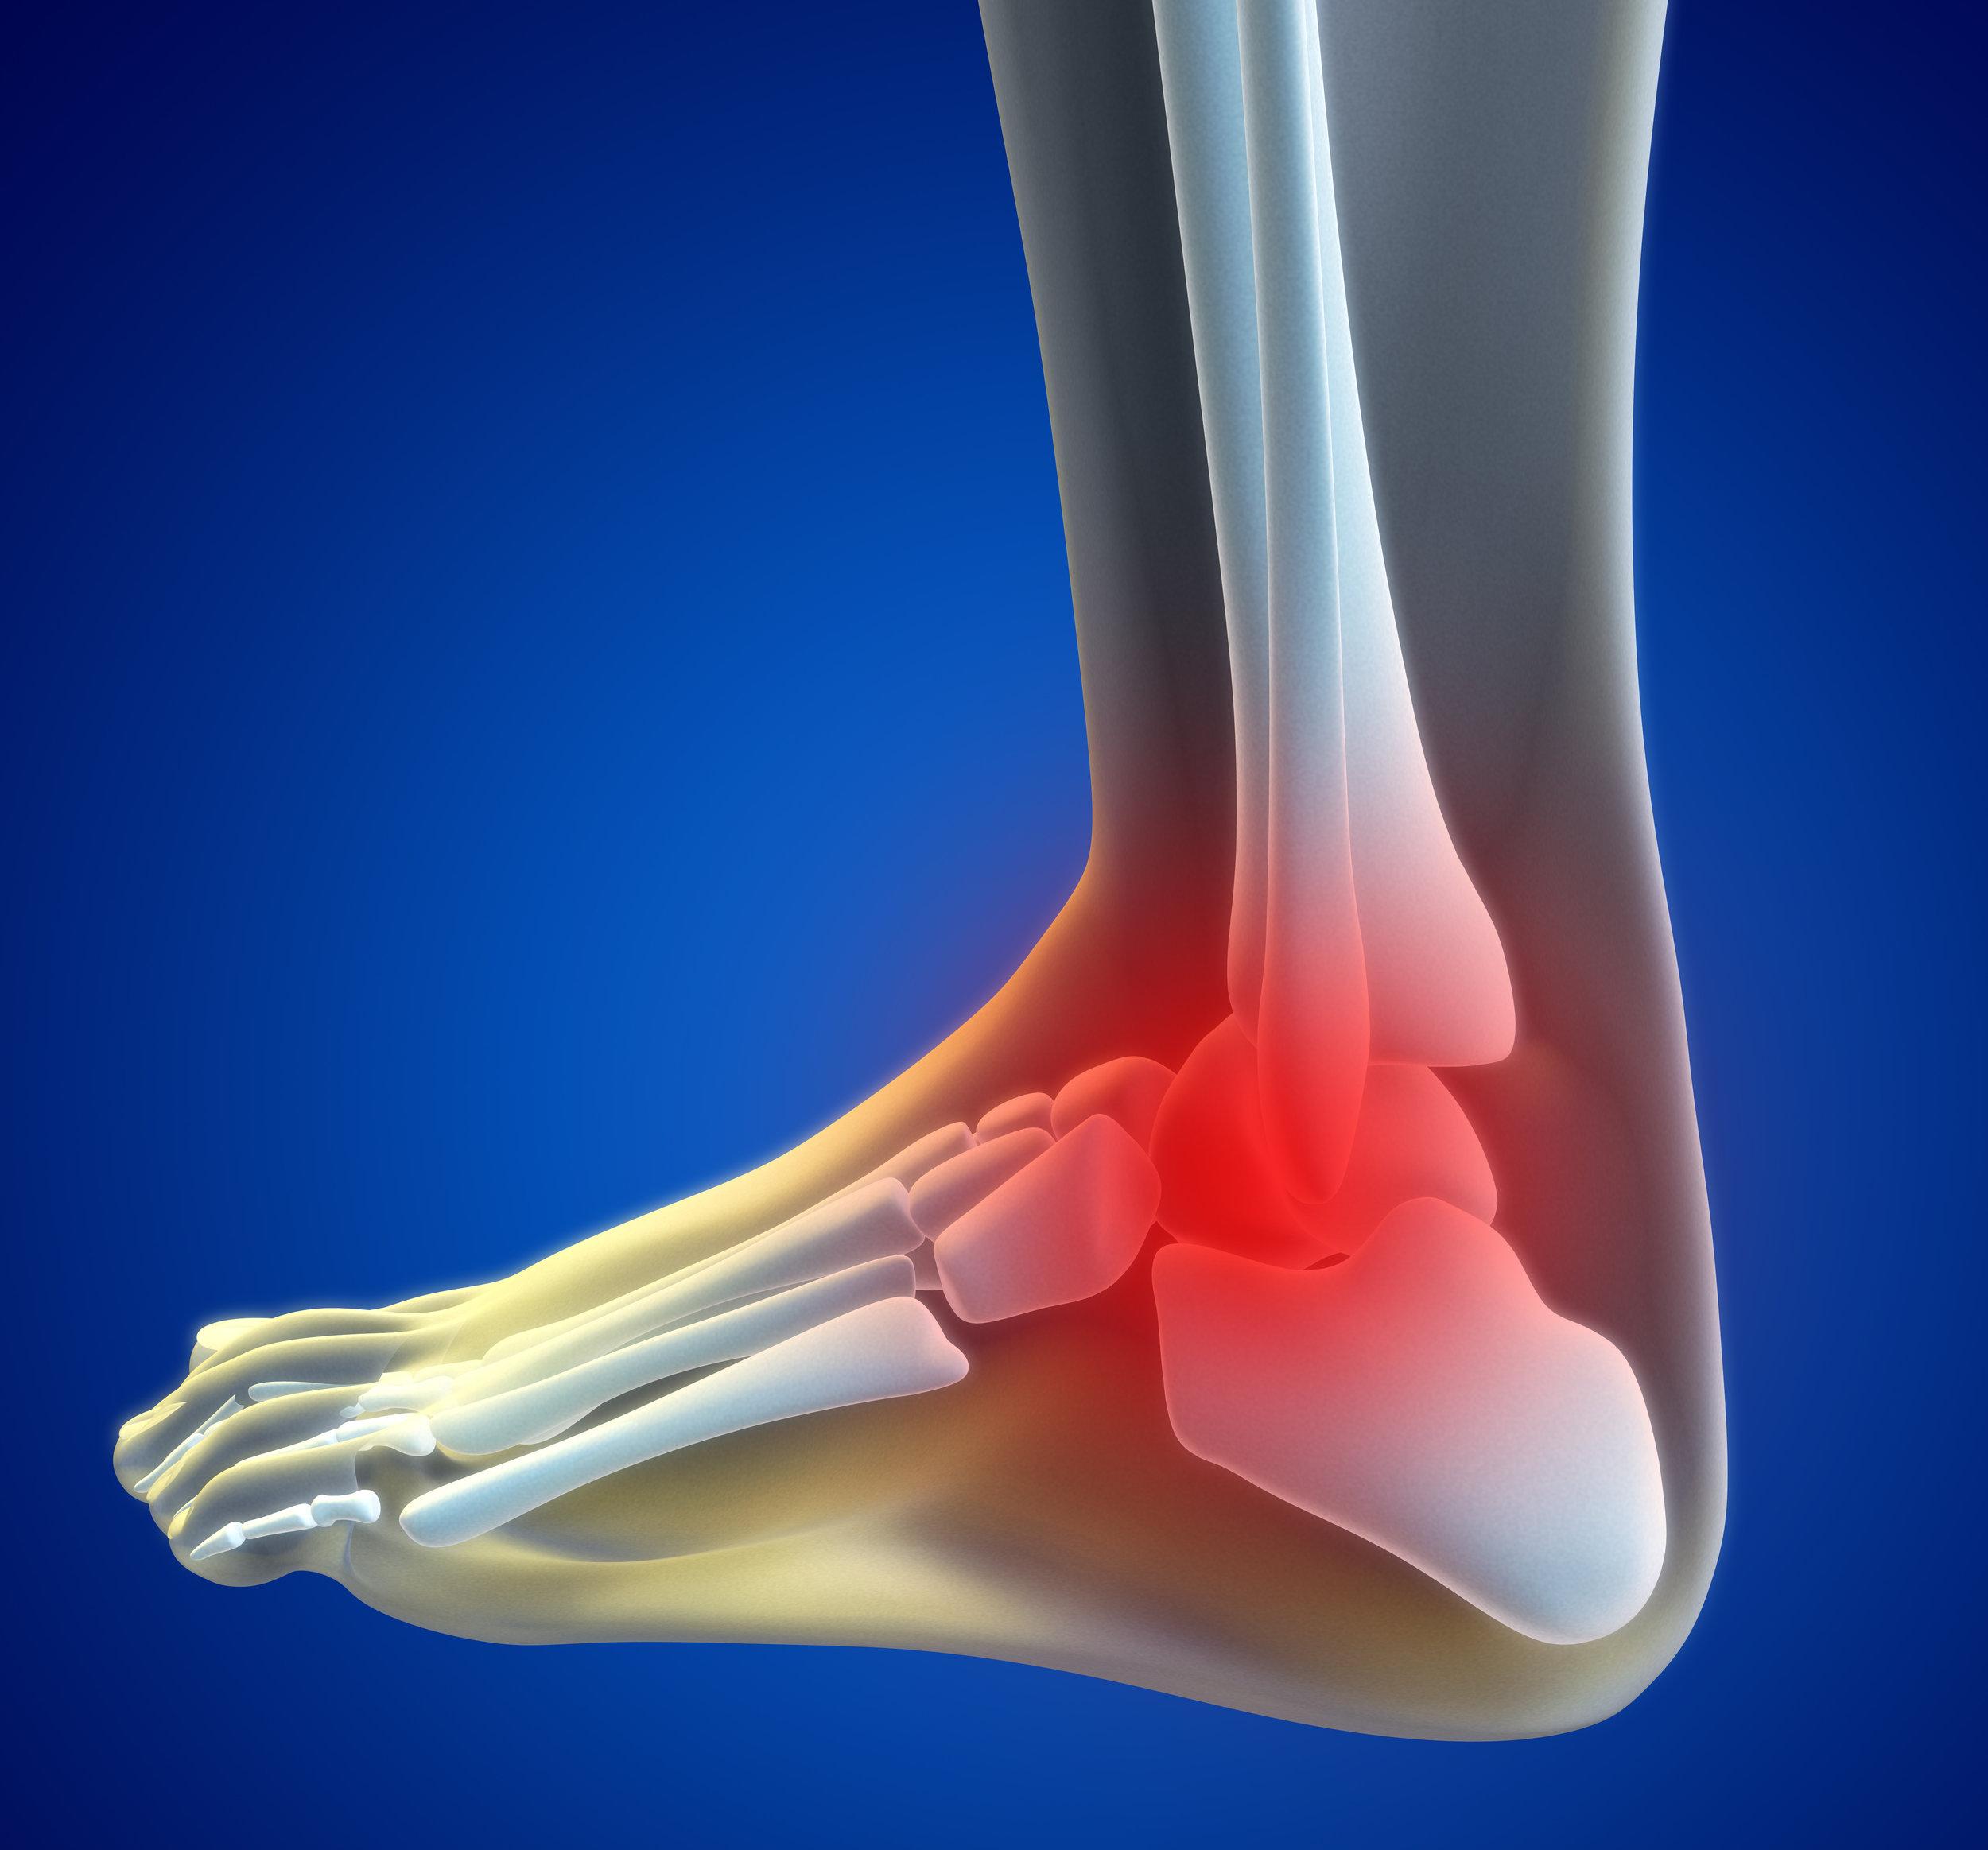 zara hercules ankle doctor